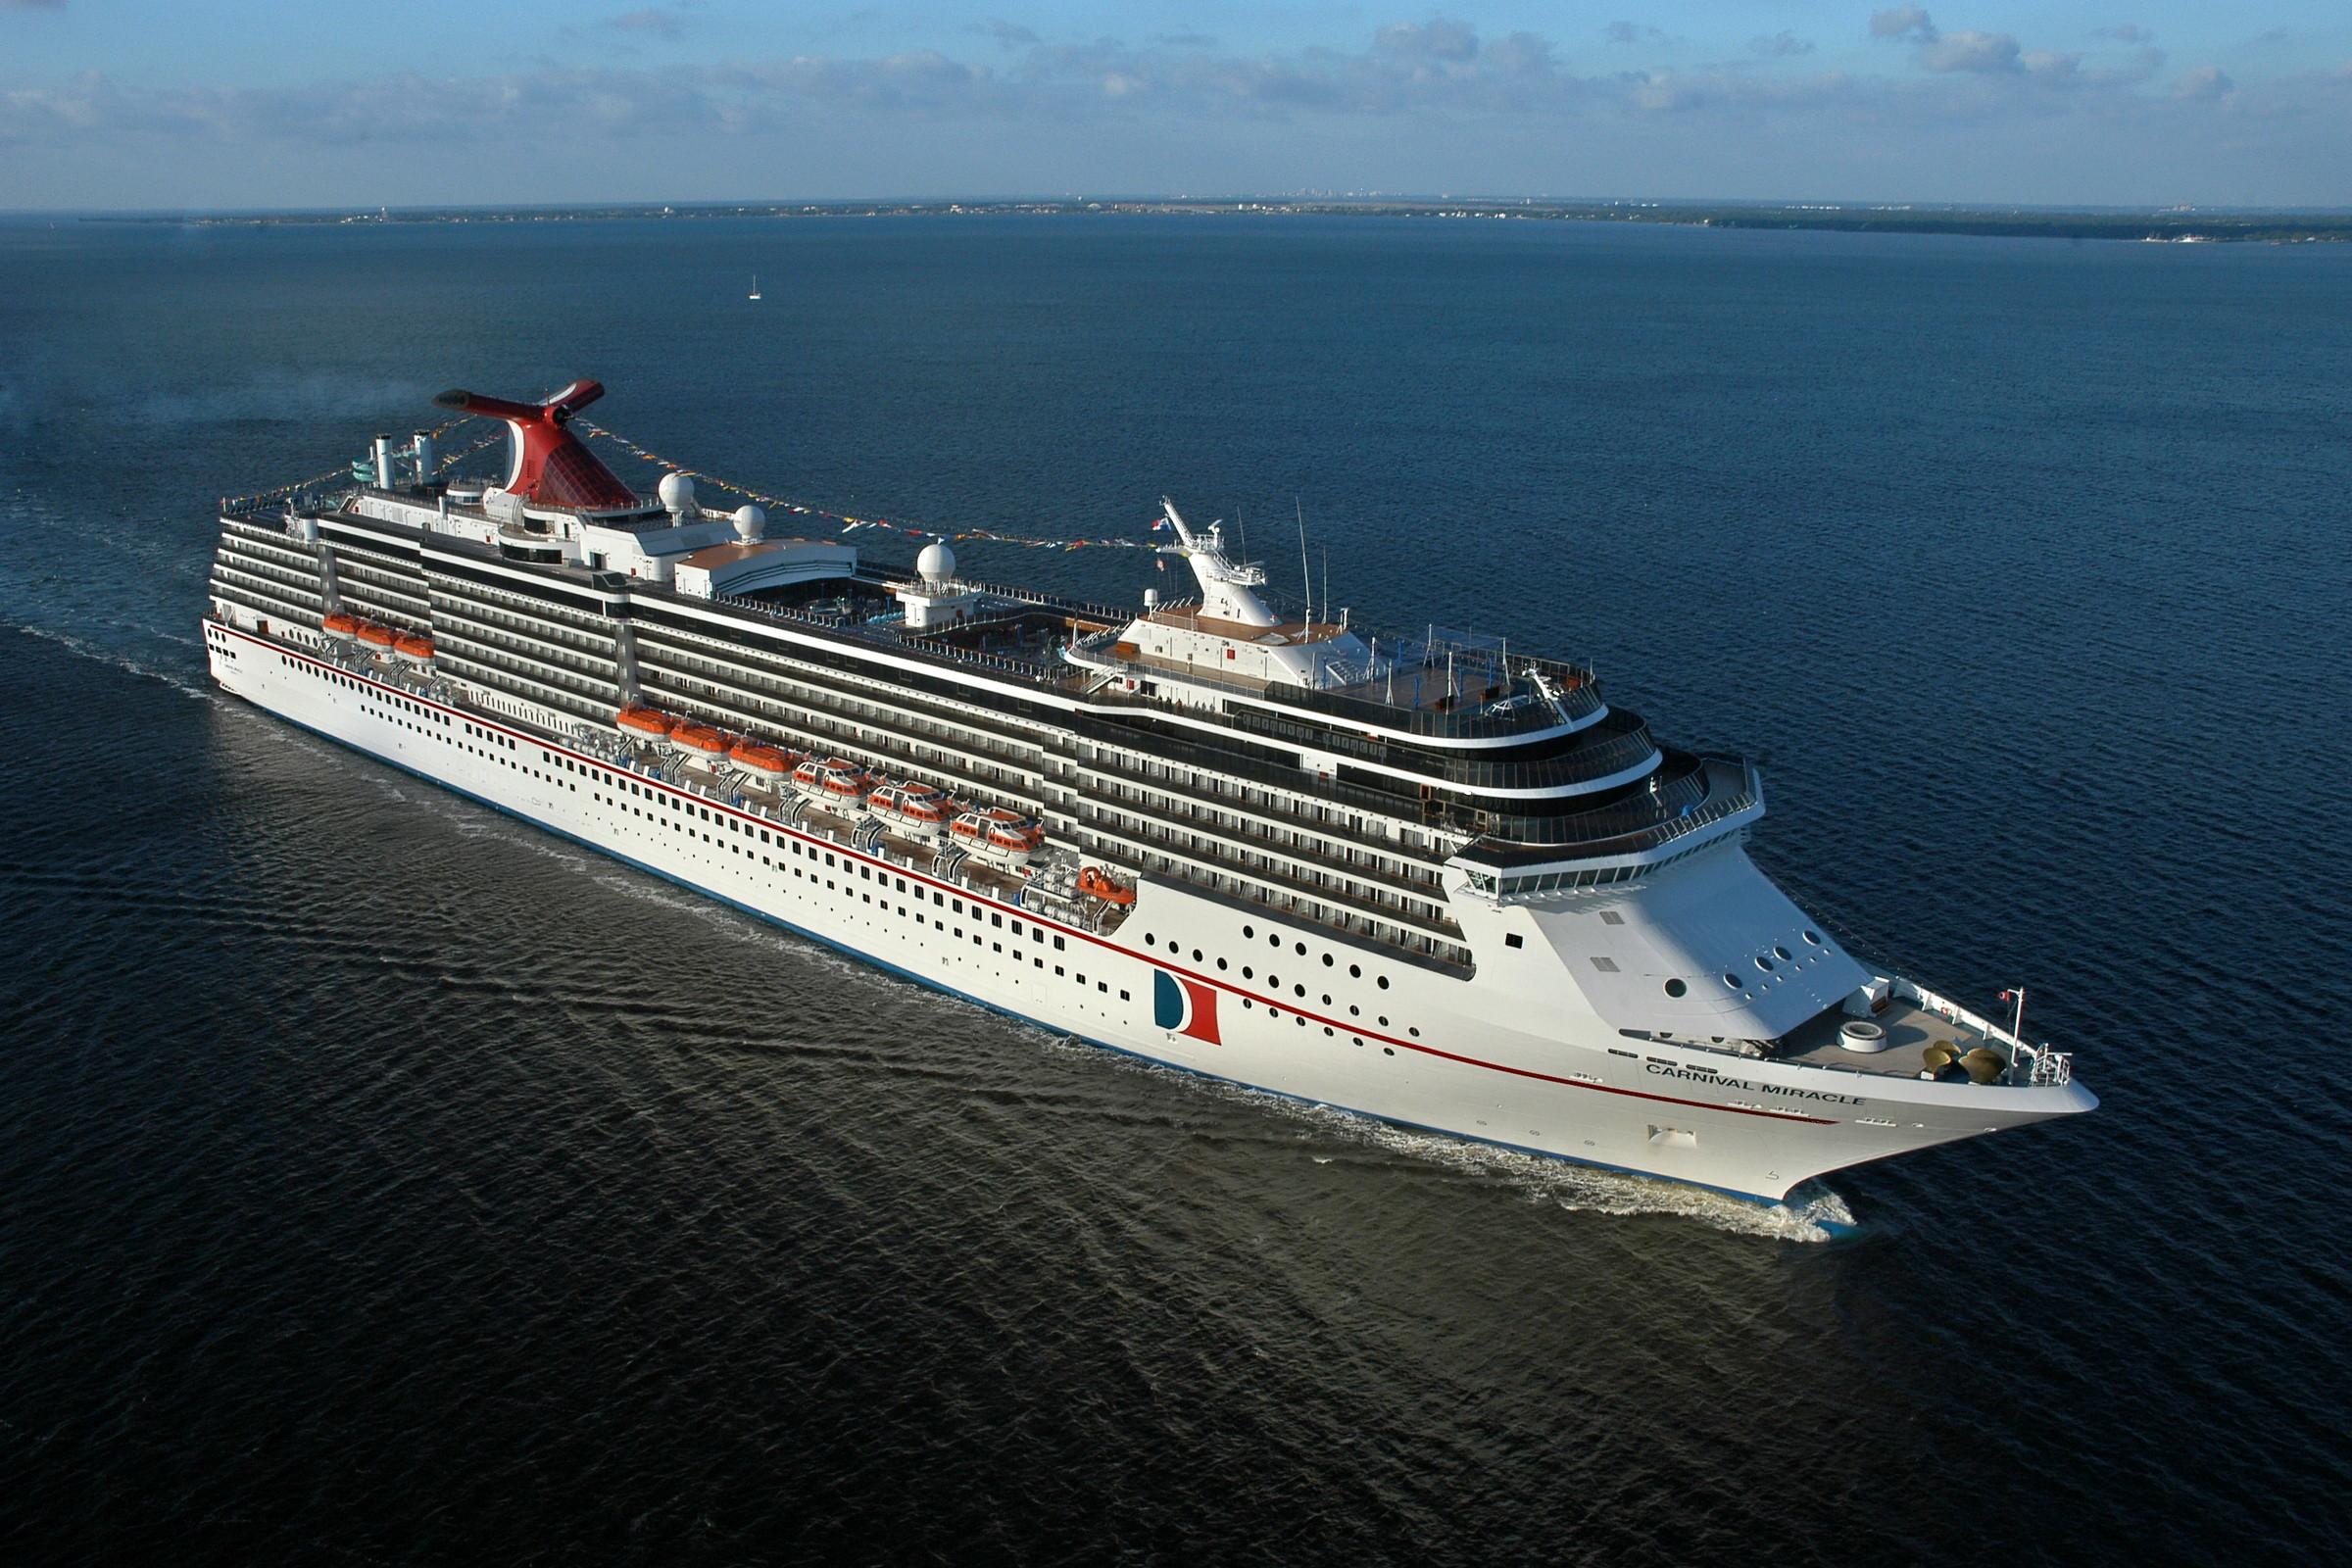 Vehicles – Cruise Ship Wallpaper